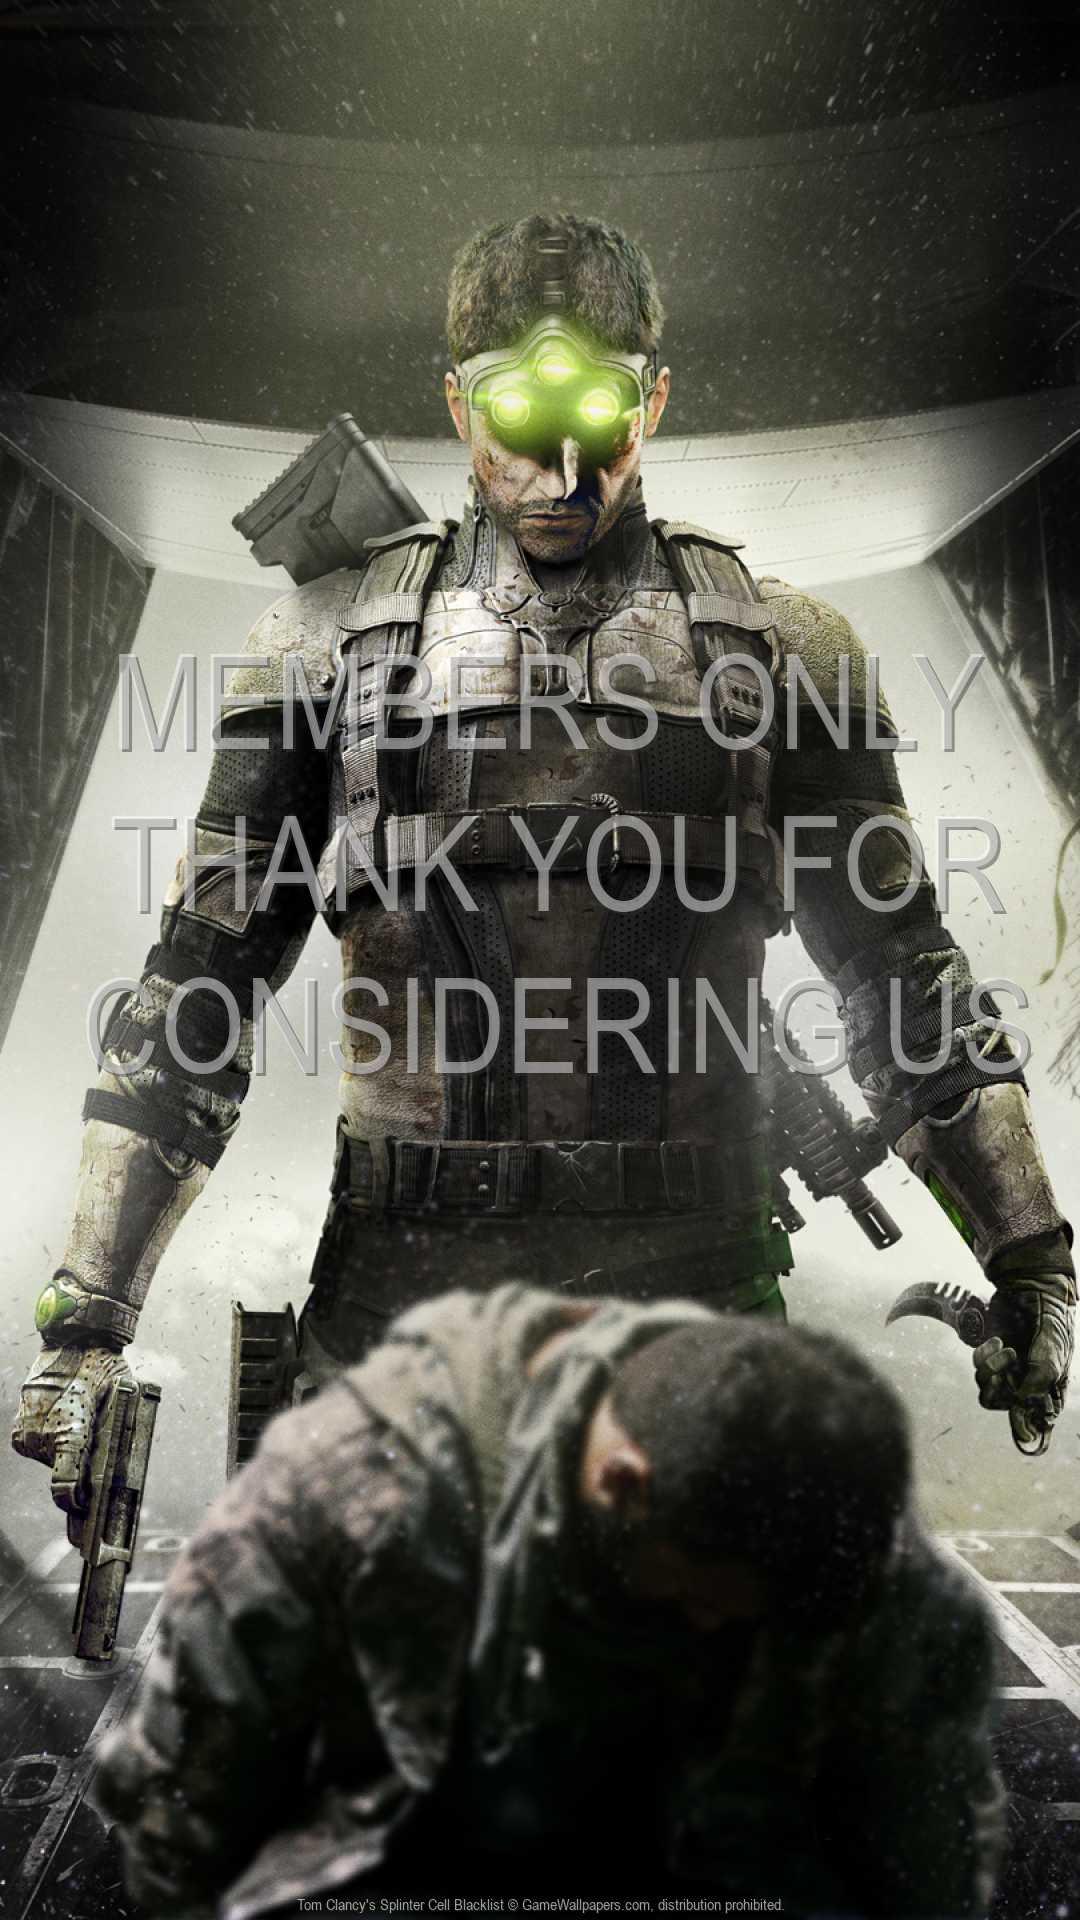 Tom Clancy's Splinter Cell: Blacklist 1080p Vertical Handy Hintergrundbild 02